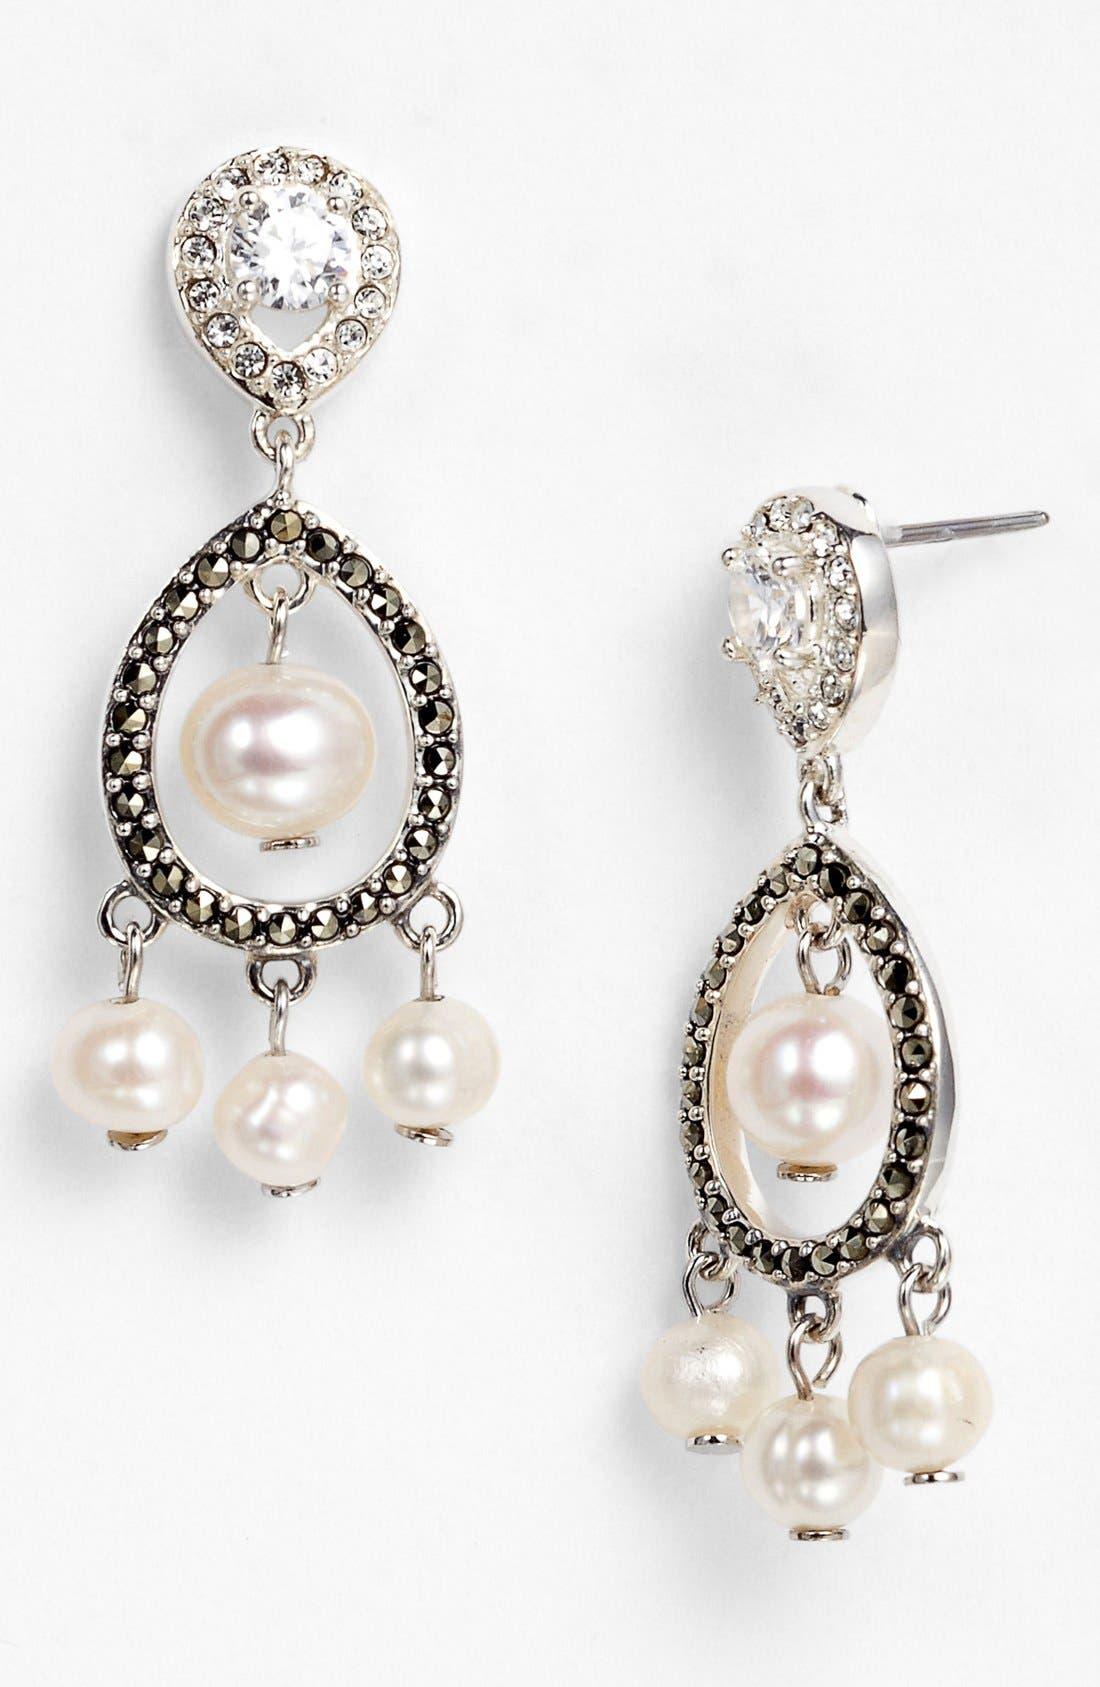 Main Image - Judith Jack 'Pearlette' Drop Earrings